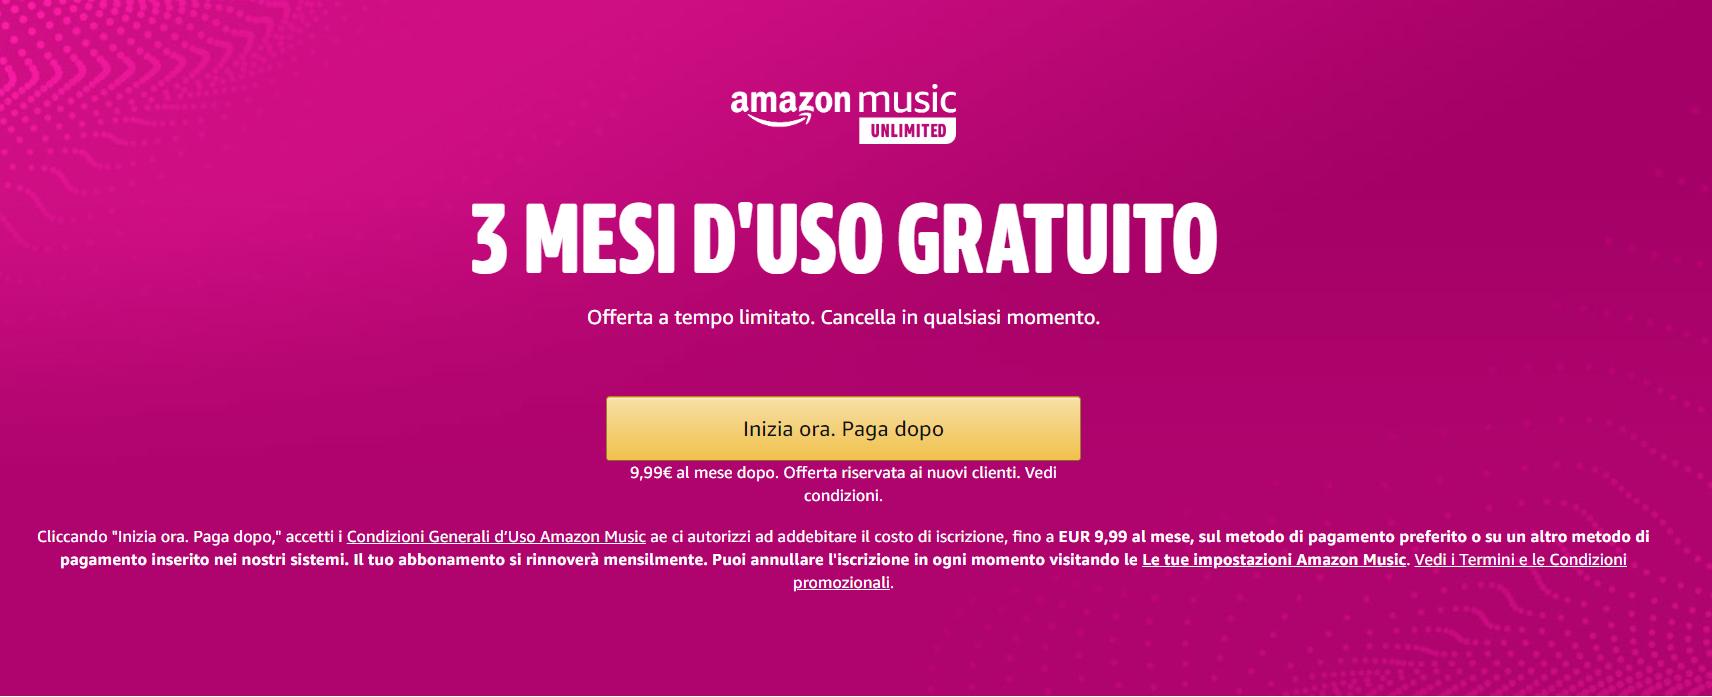 amazon music unlimited promo 3 mesi gratis